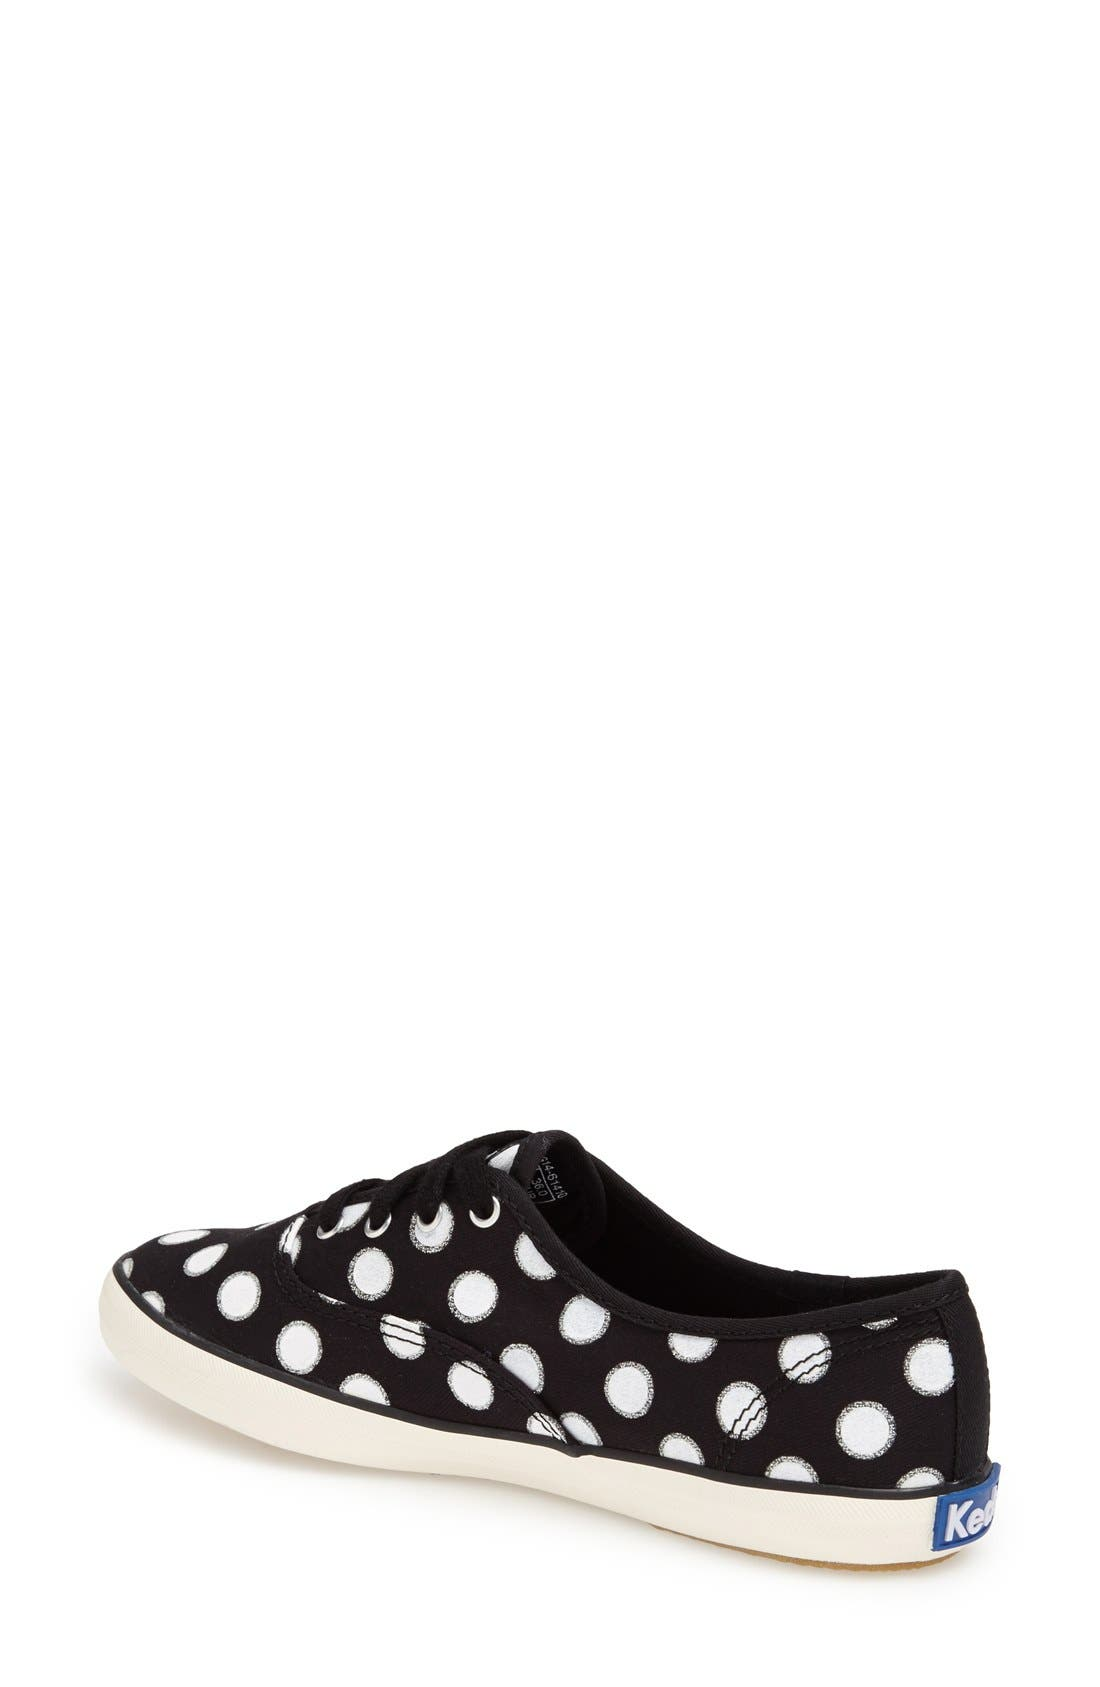 Alternate Image 2  - Keds® 'Champion - Glitter Dot' Canvas Sneaker (Women) (Regular Retail Price: $49.95)